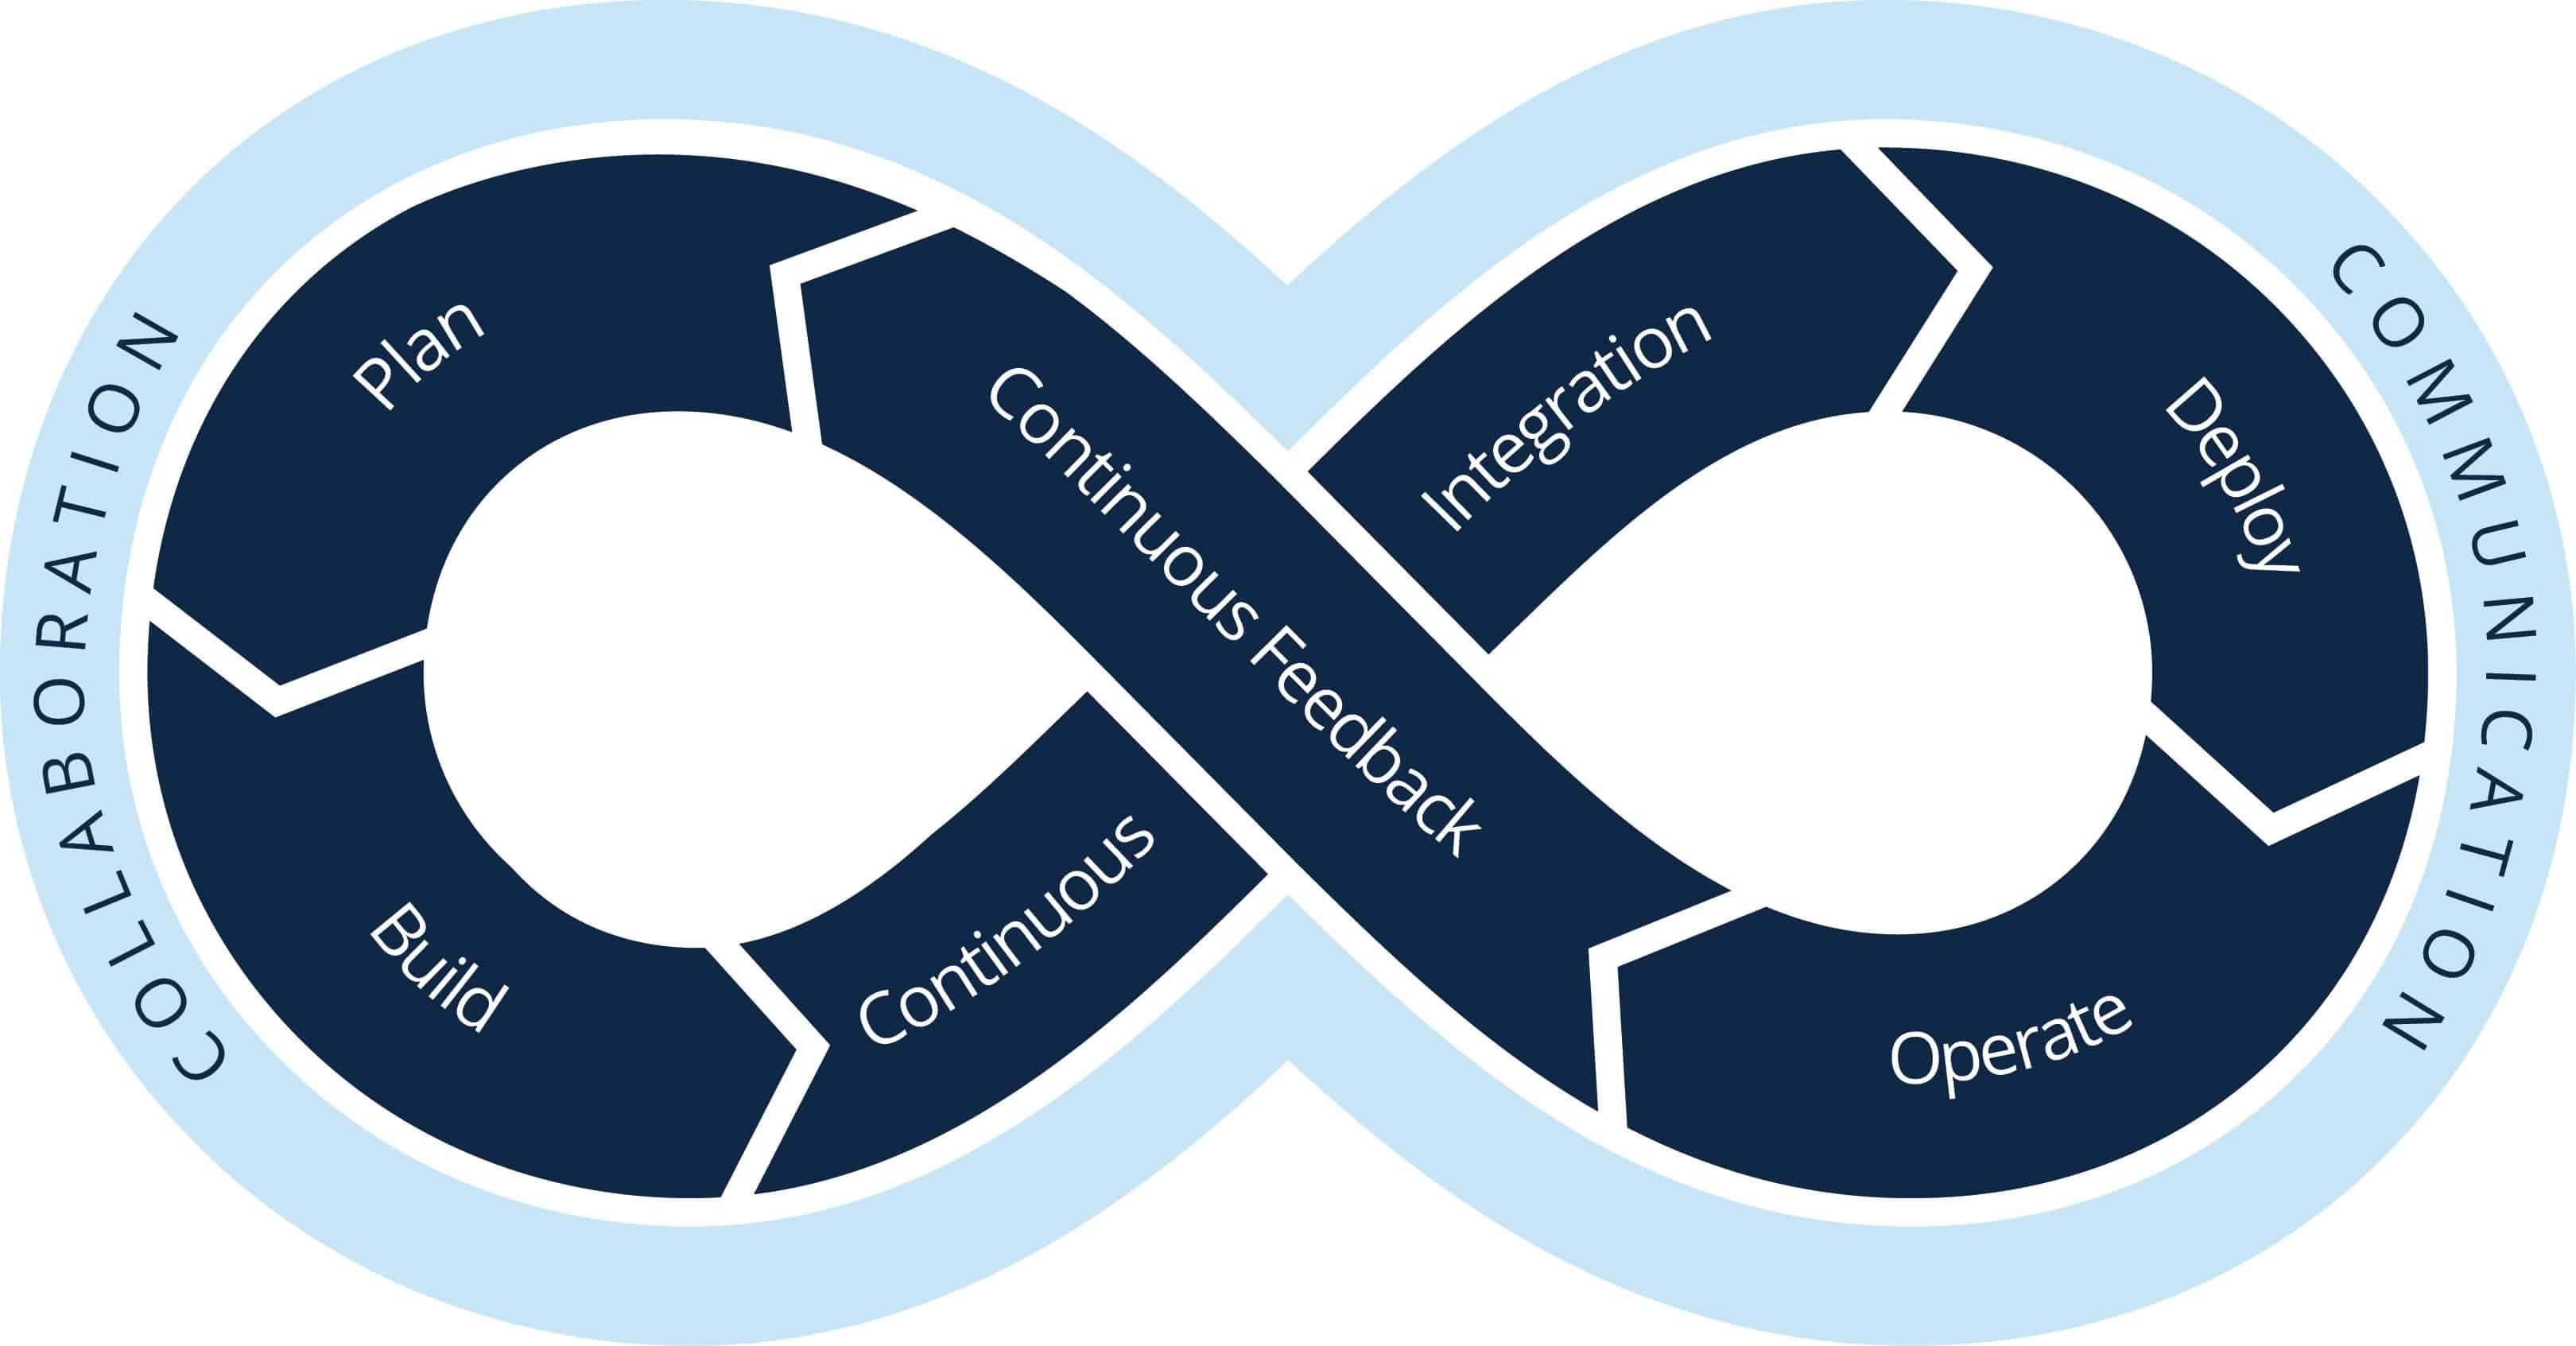 Continuous Software Development Guide